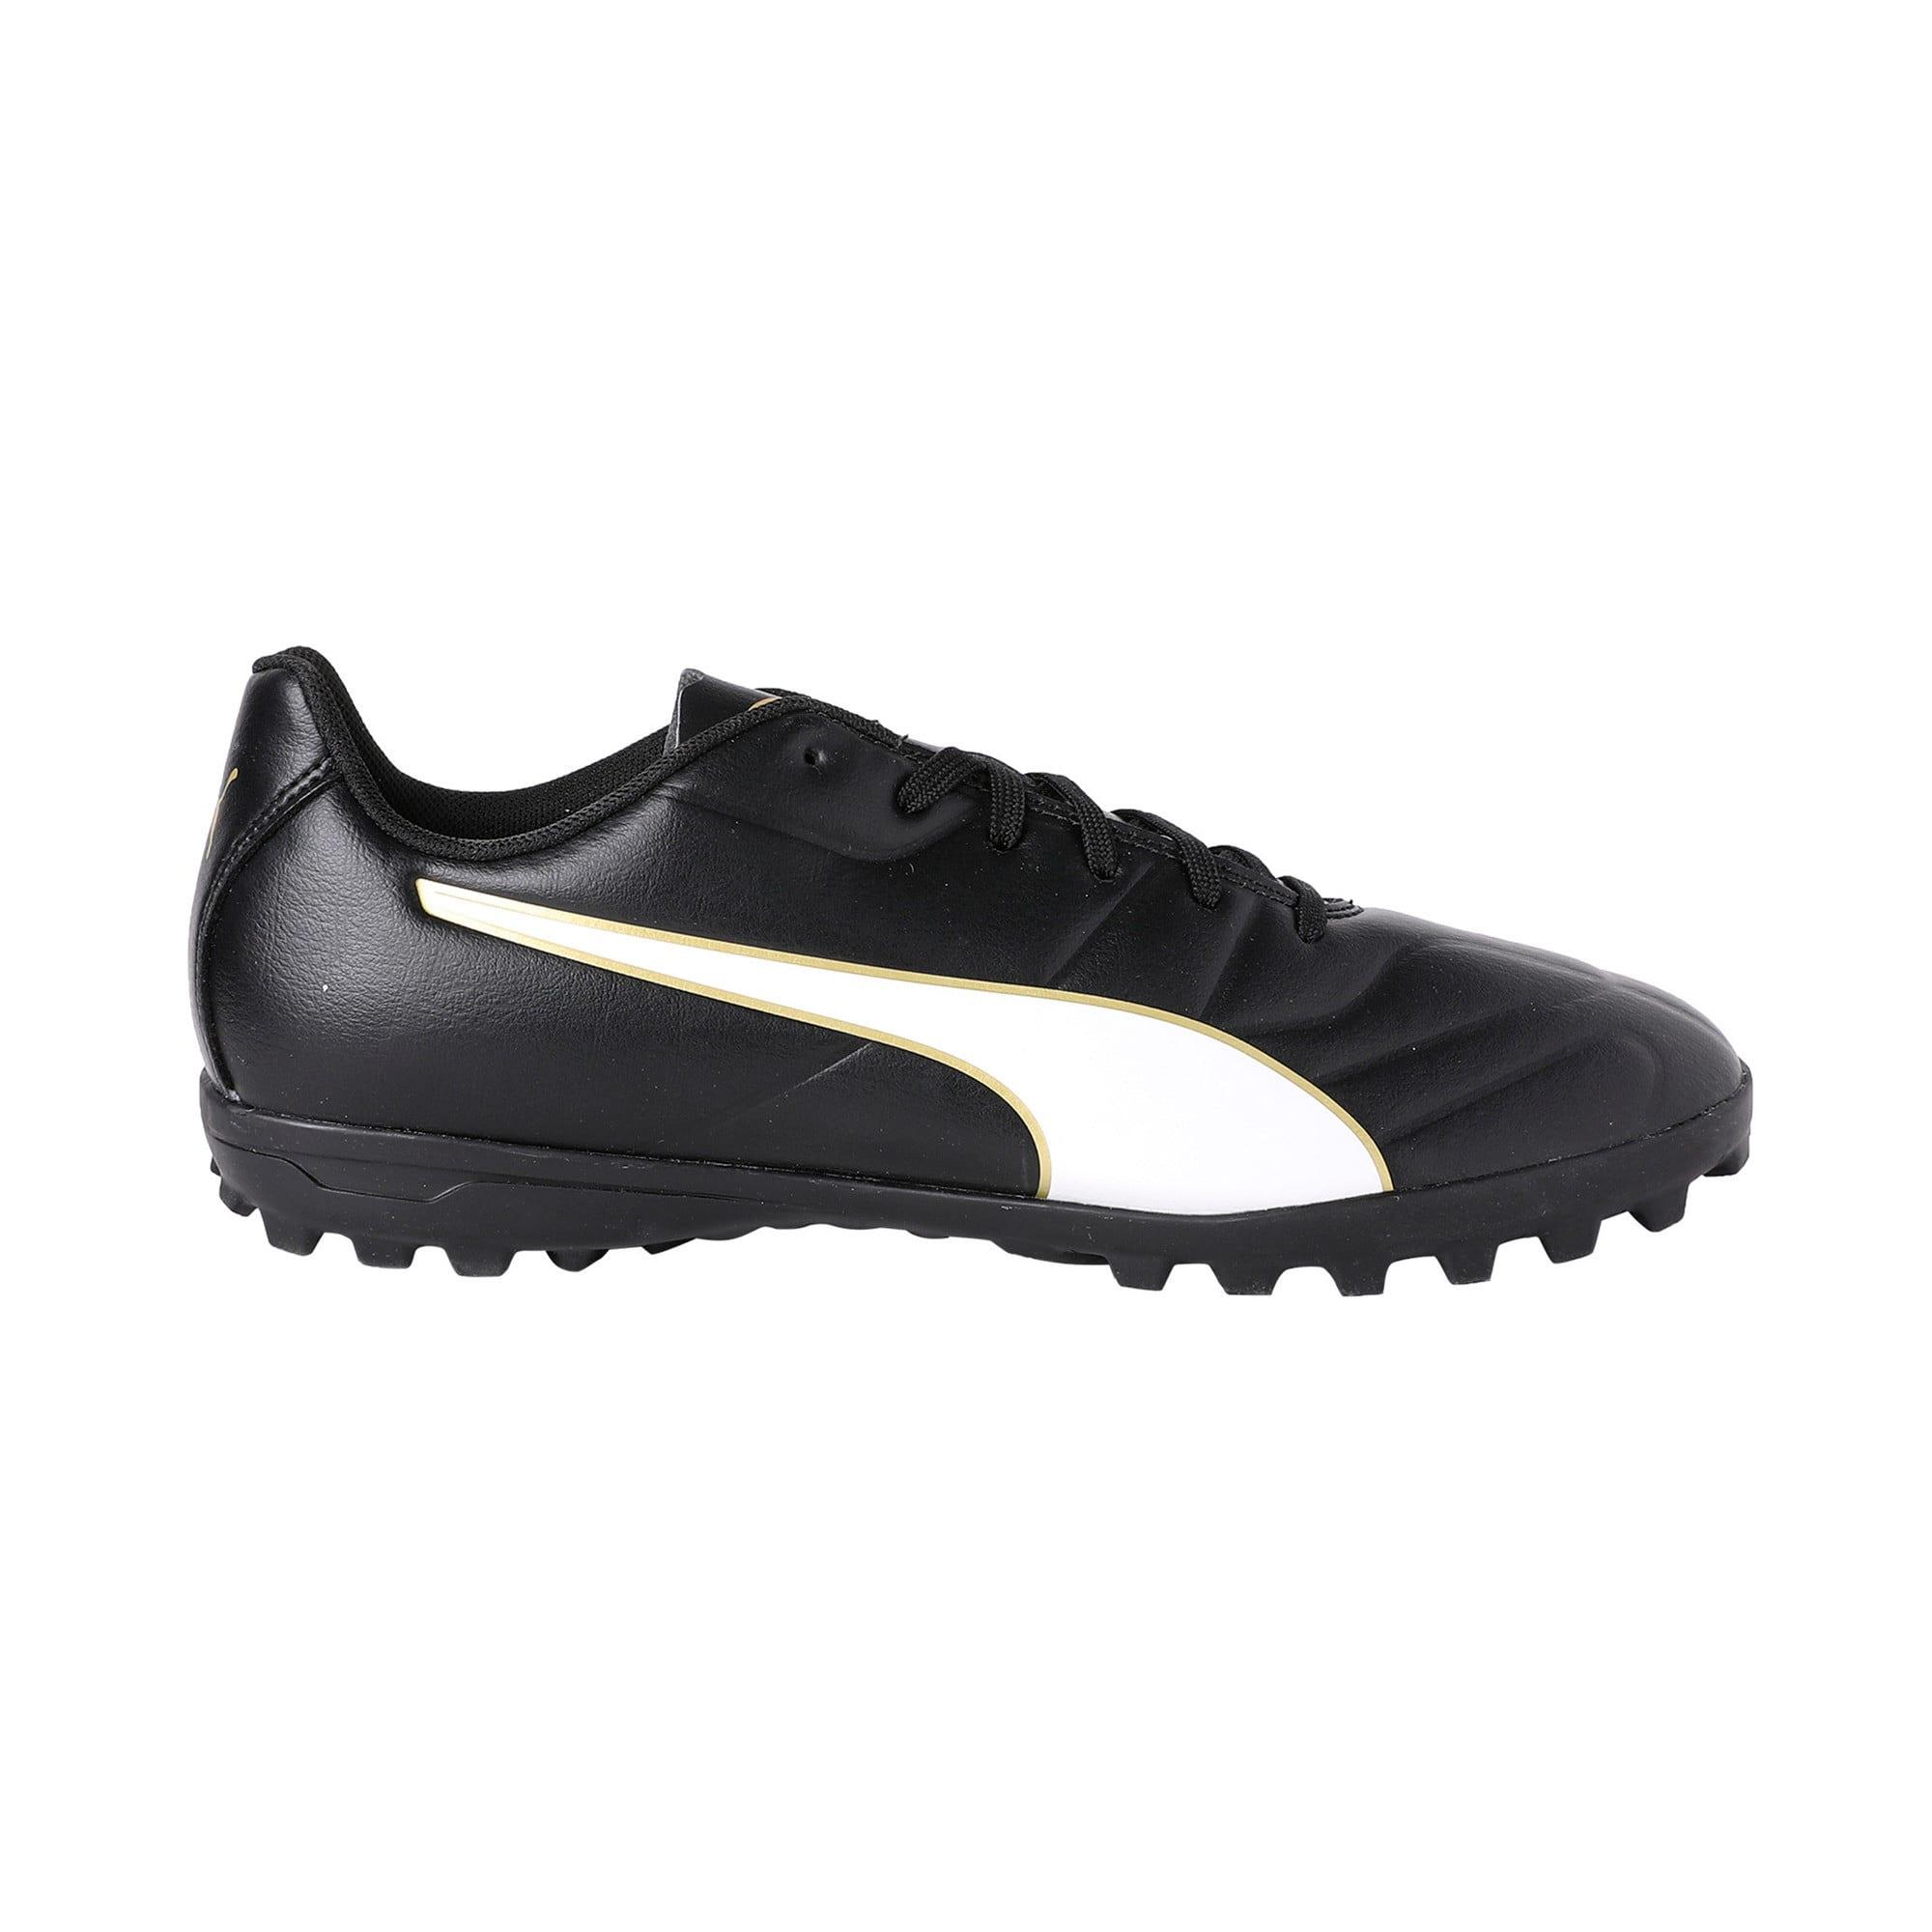 Thumbnail 5 of Classico C II Men's Football Boots, Black-White-Gold, medium-IND